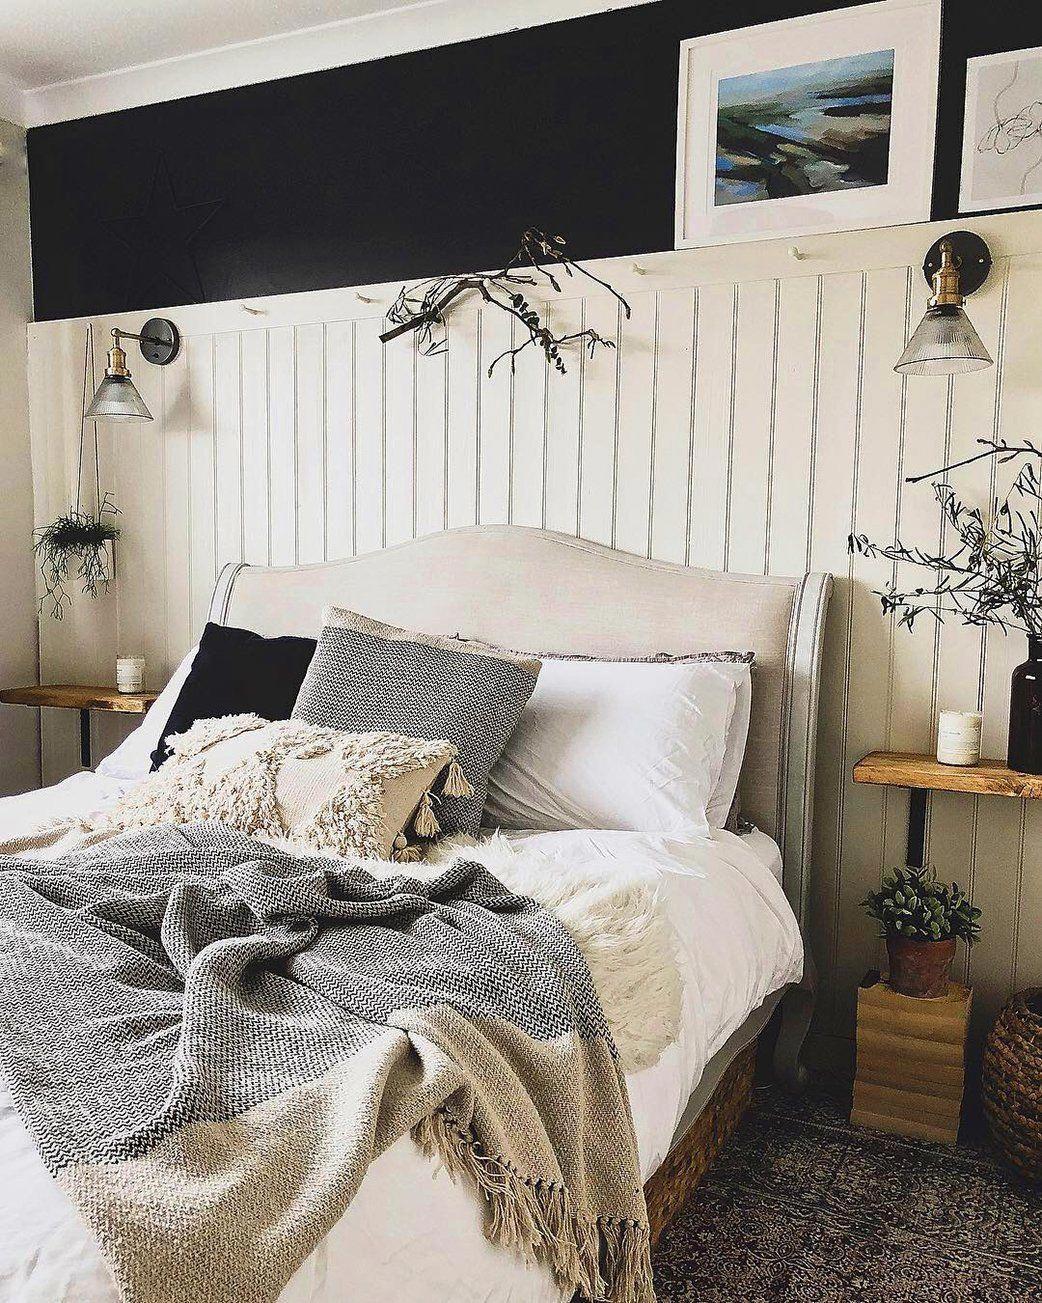 Hygge bedroom interior design hyggebedroom in 2020